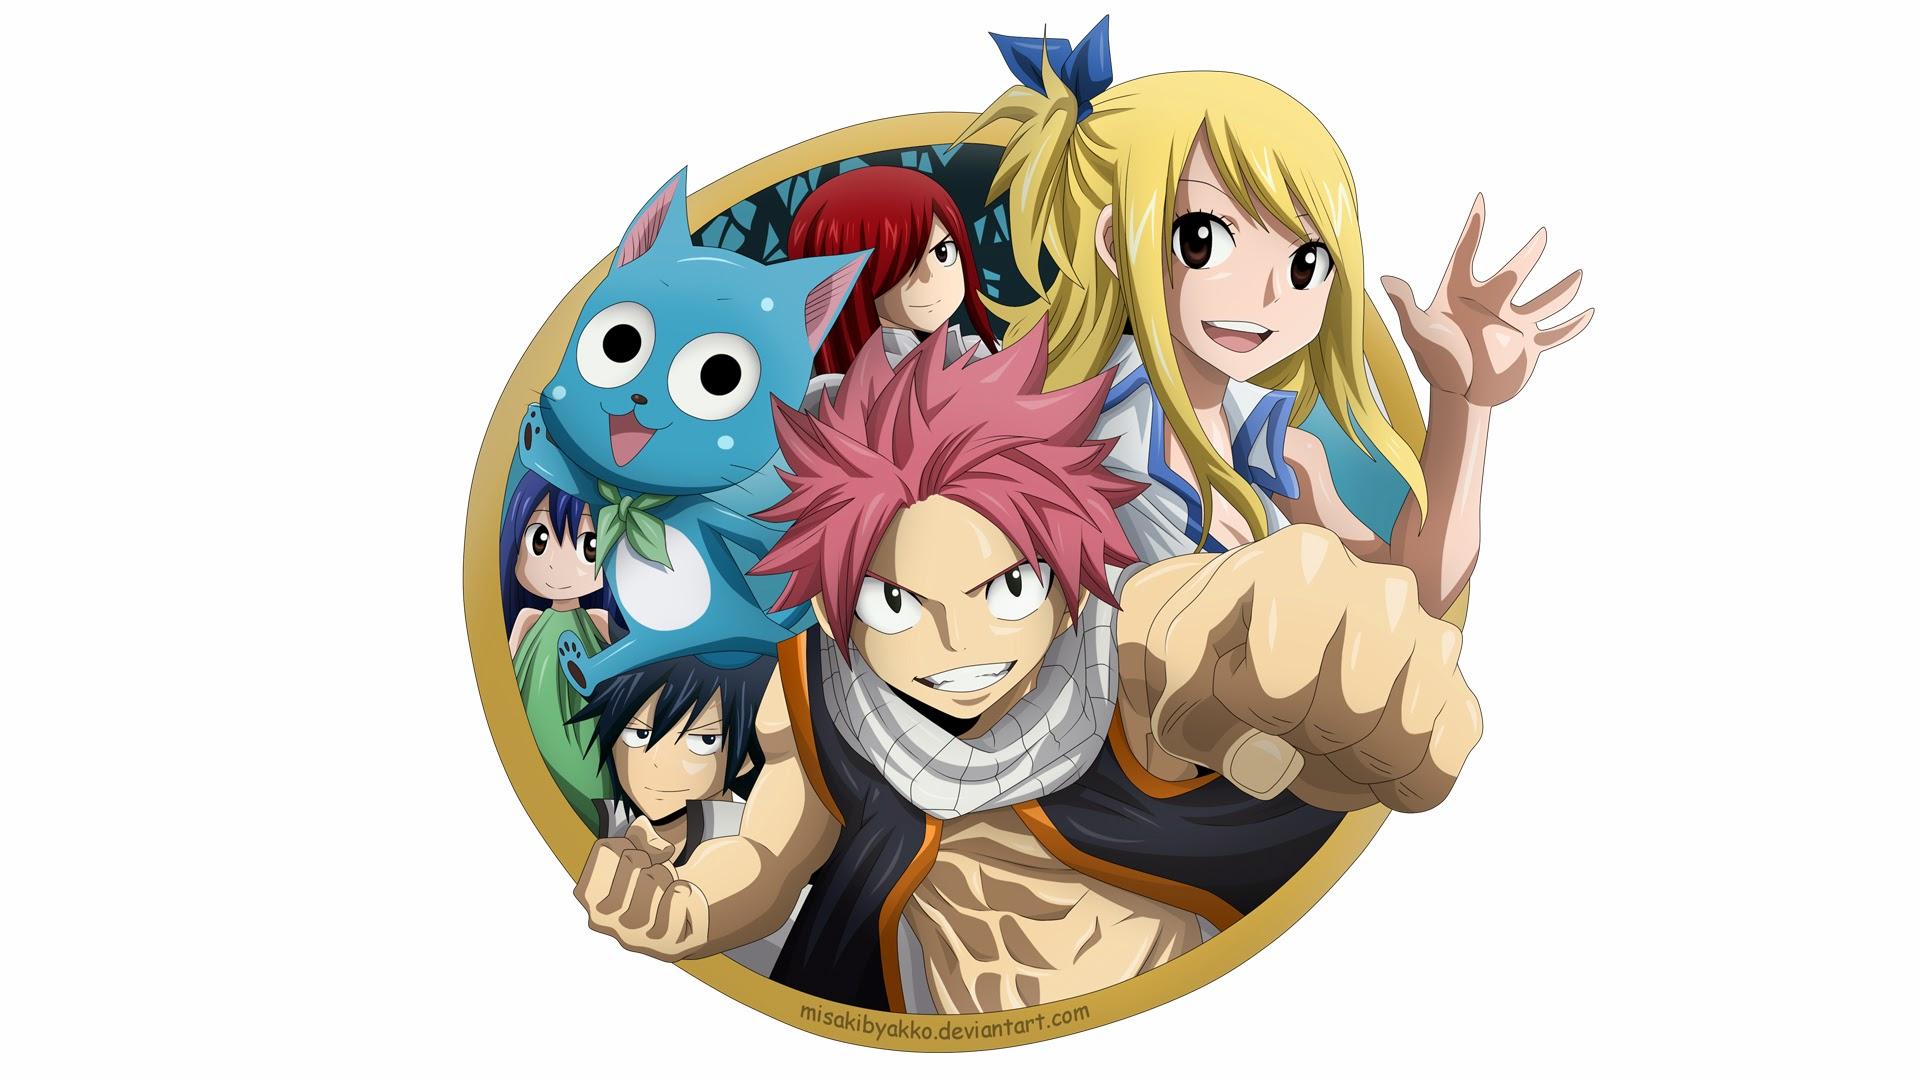 Fairy Tail Anime Image 8k Wallpaper HD